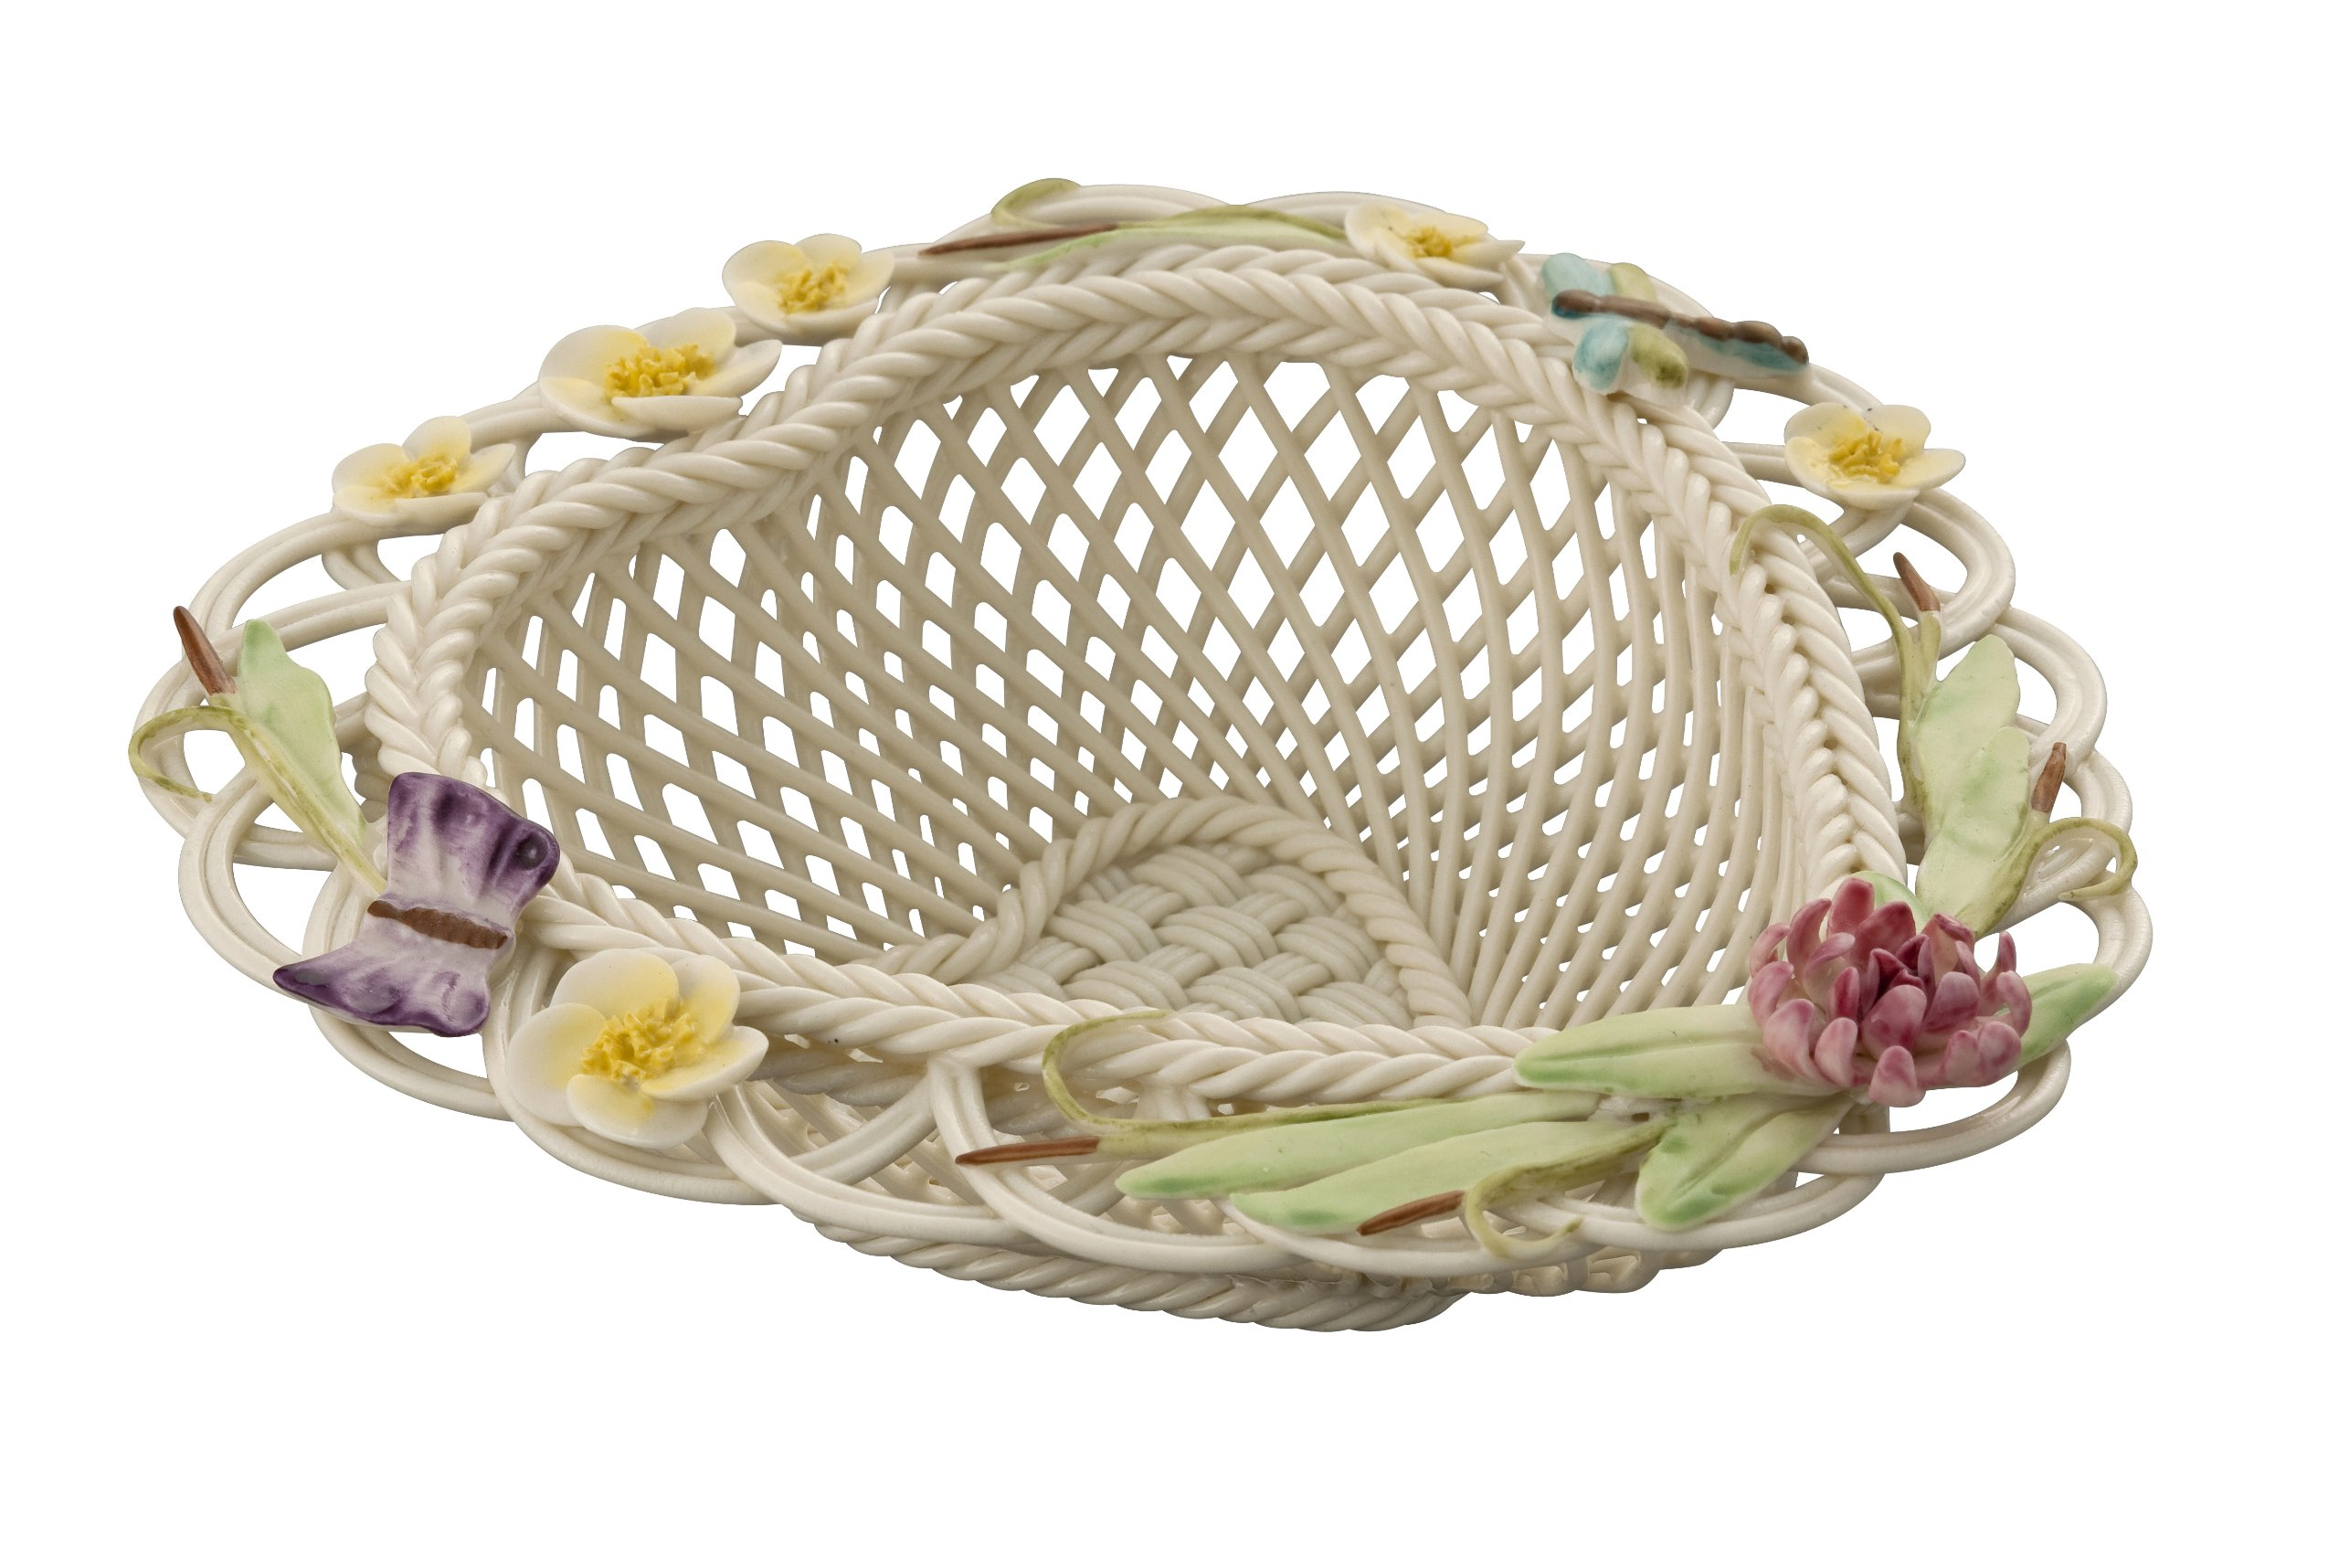 Belleek Lough Erne Basket